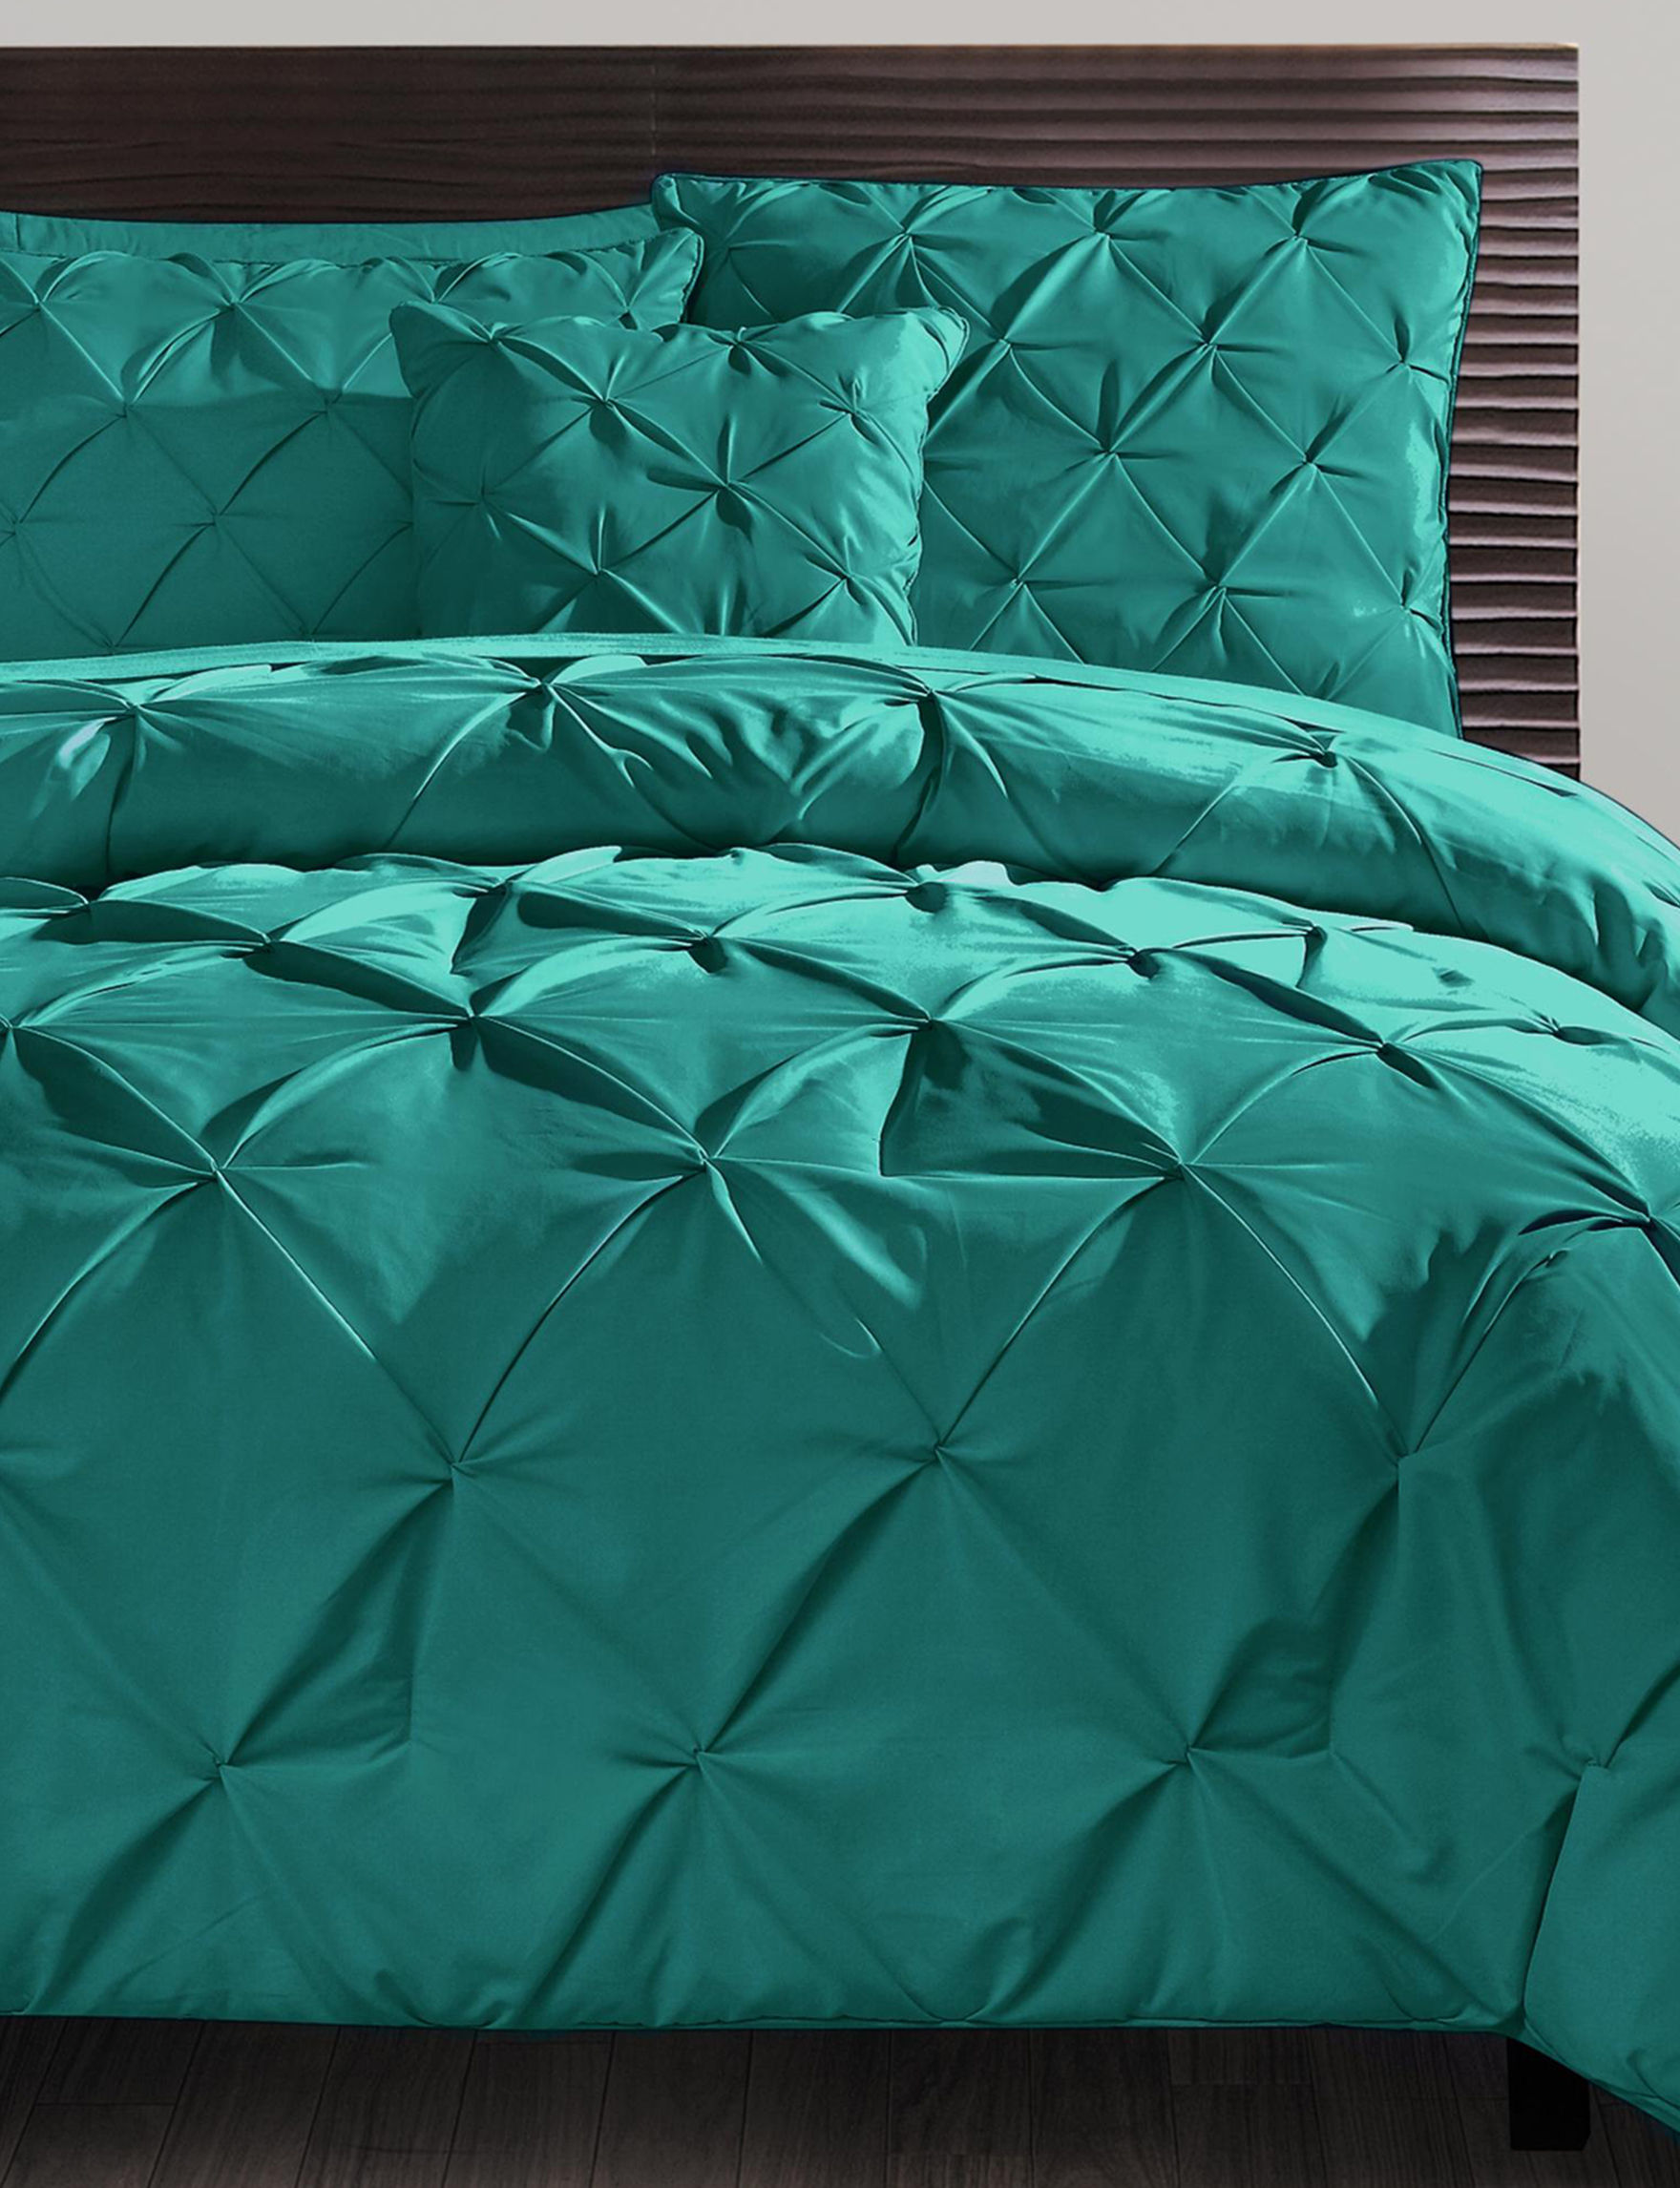 VCNY Home Teal Comforters & Comforter Sets